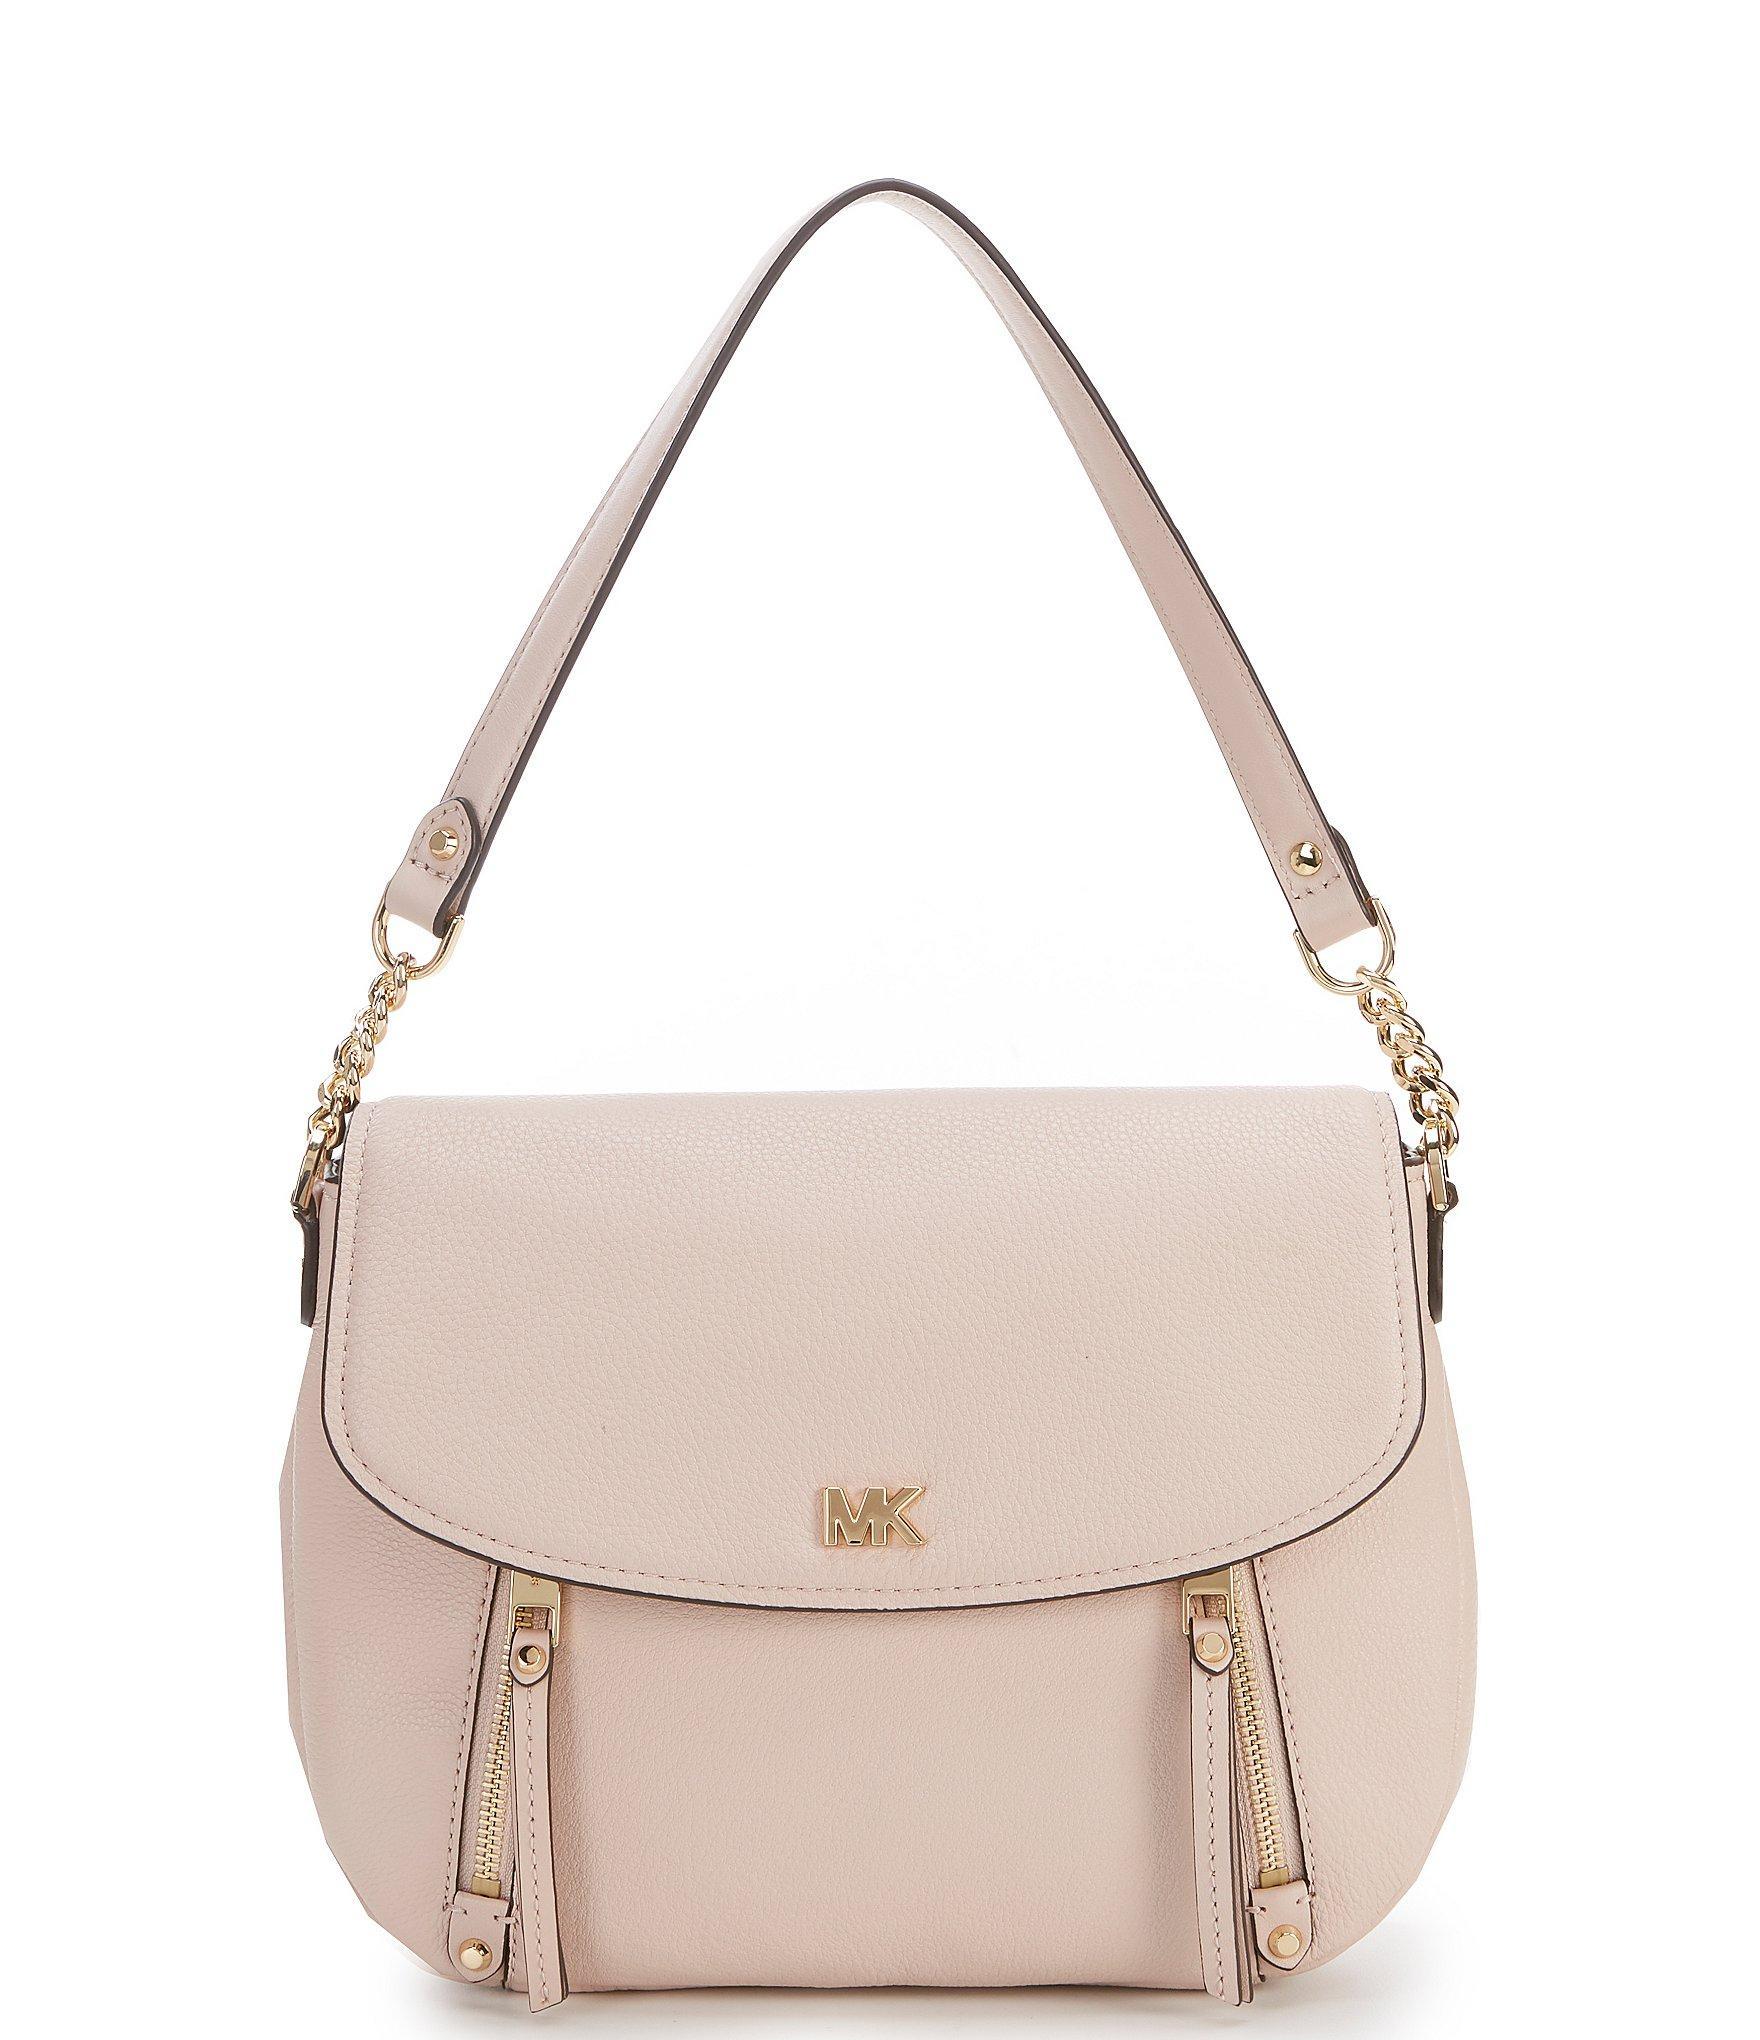 a7660999002d Lyst - MICHAEL Michael Kors Evie Medium Shoulder Bag in Pink